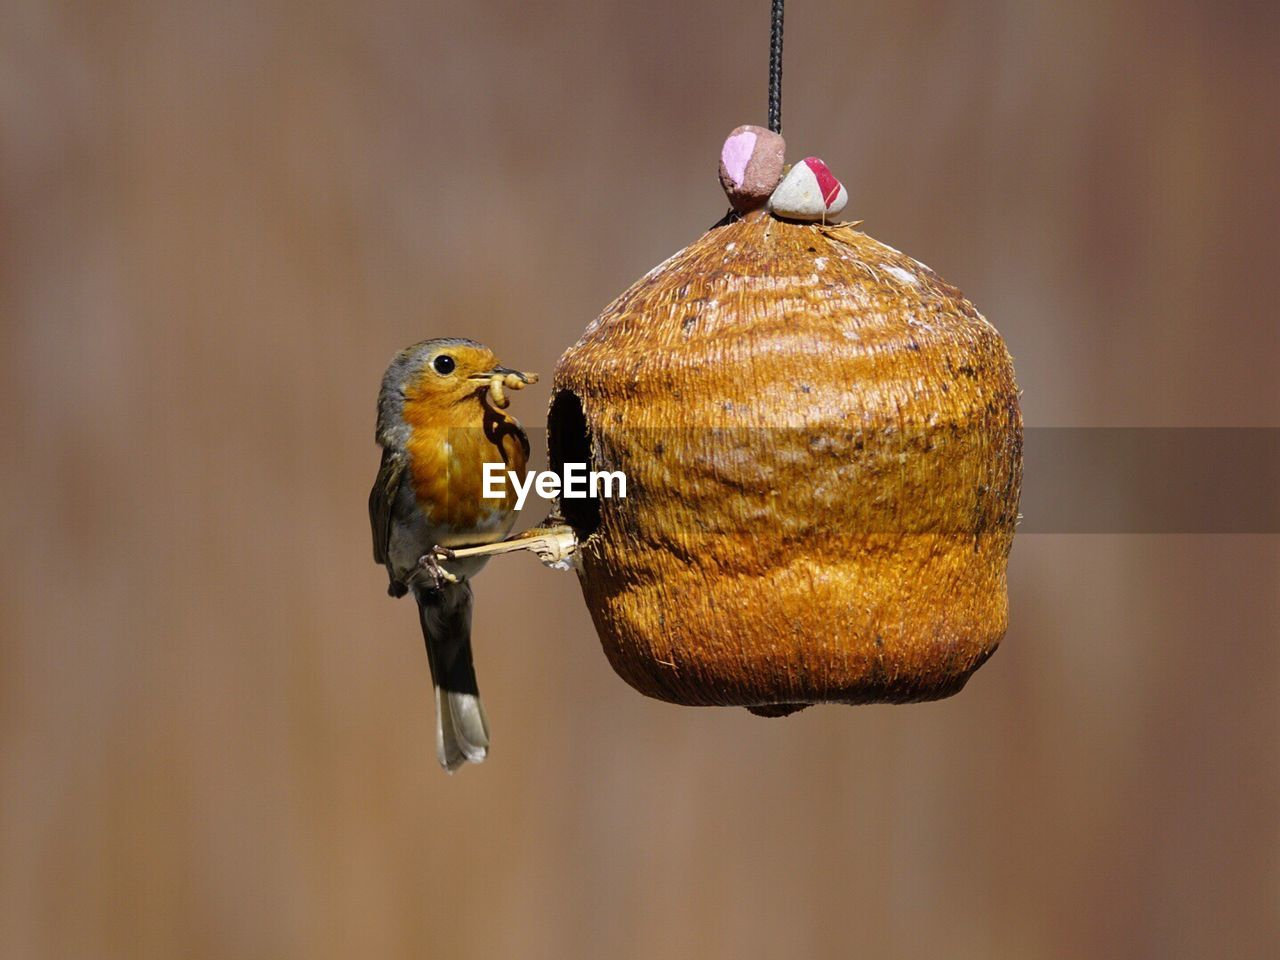 Robin Carrying Worm In Beak On Feeder